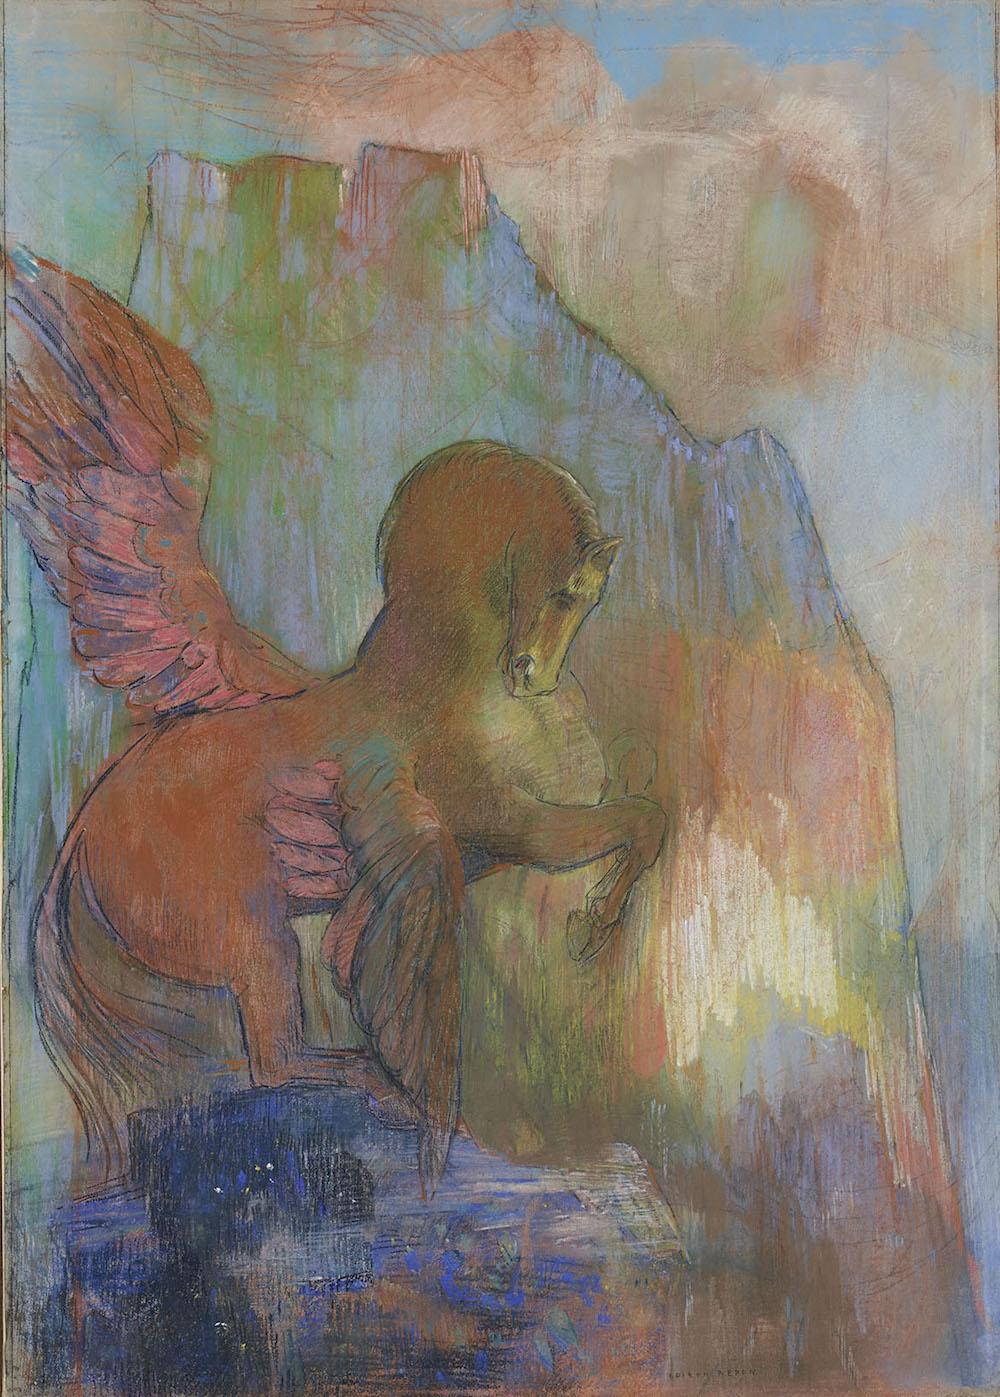 Pégase by Odilon Redon, circa 1895-1900, Private Collection